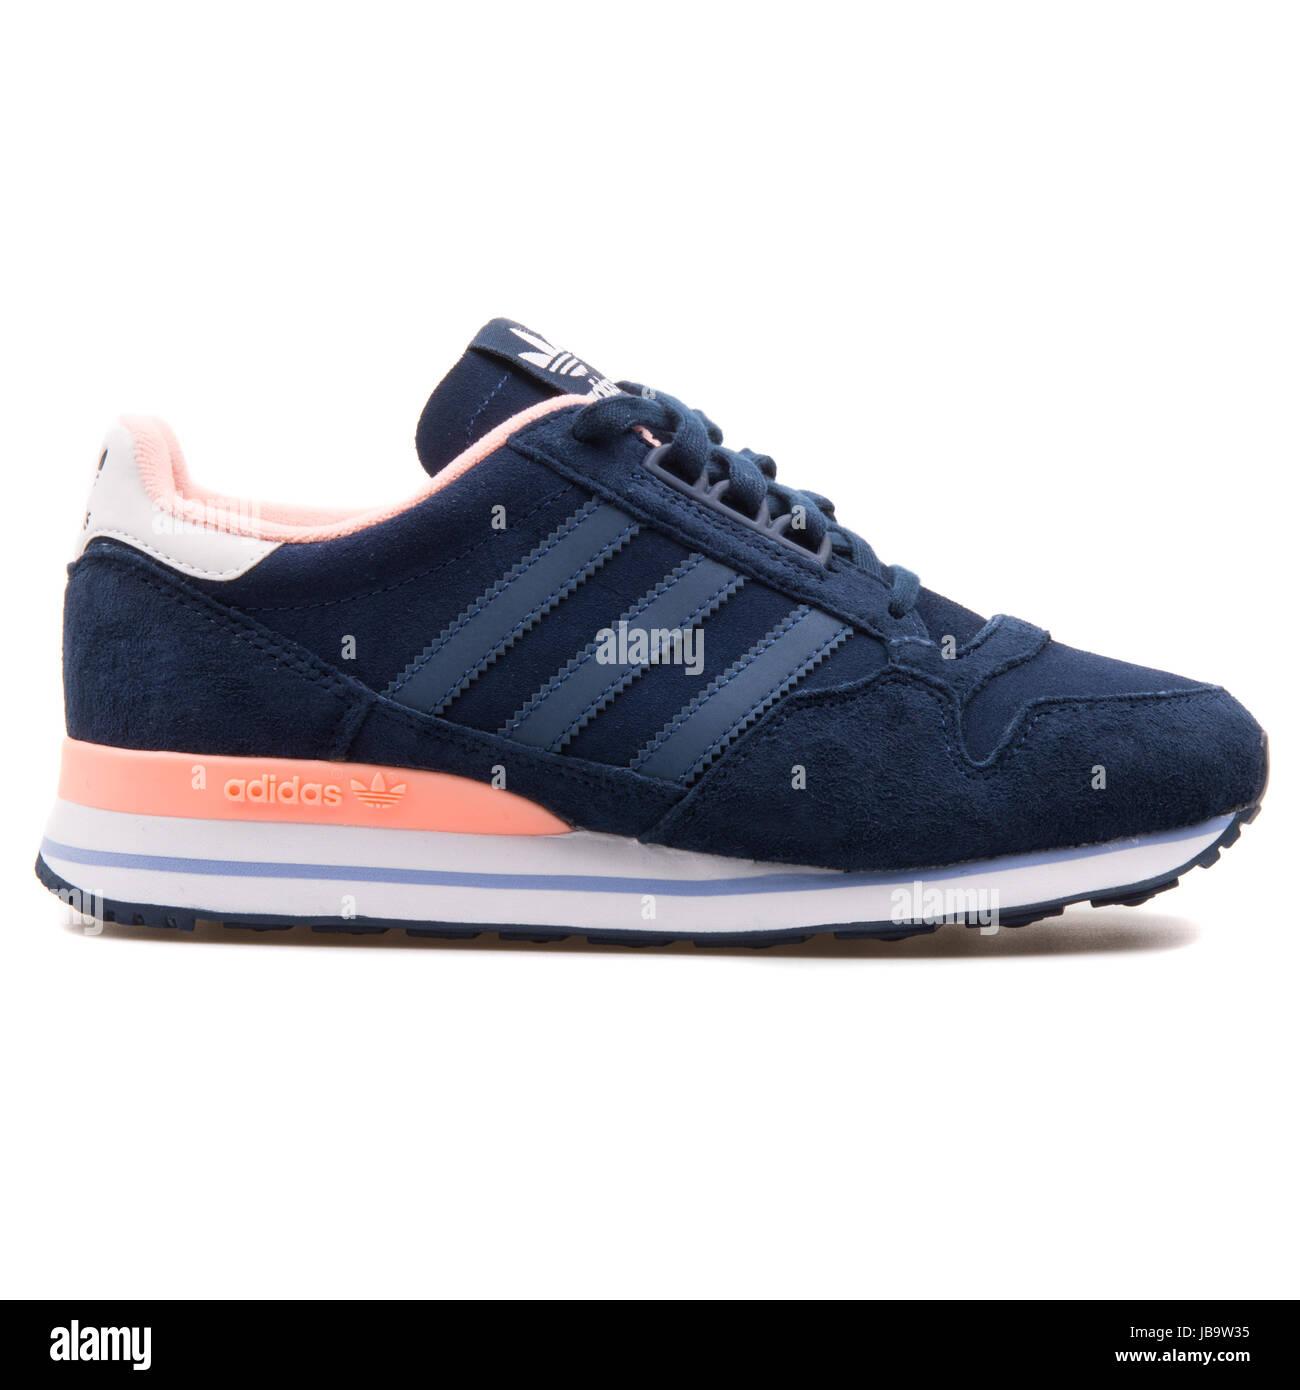 Adidas ZX 500 OG W Dark Blue and Rose Women's Running Shoes